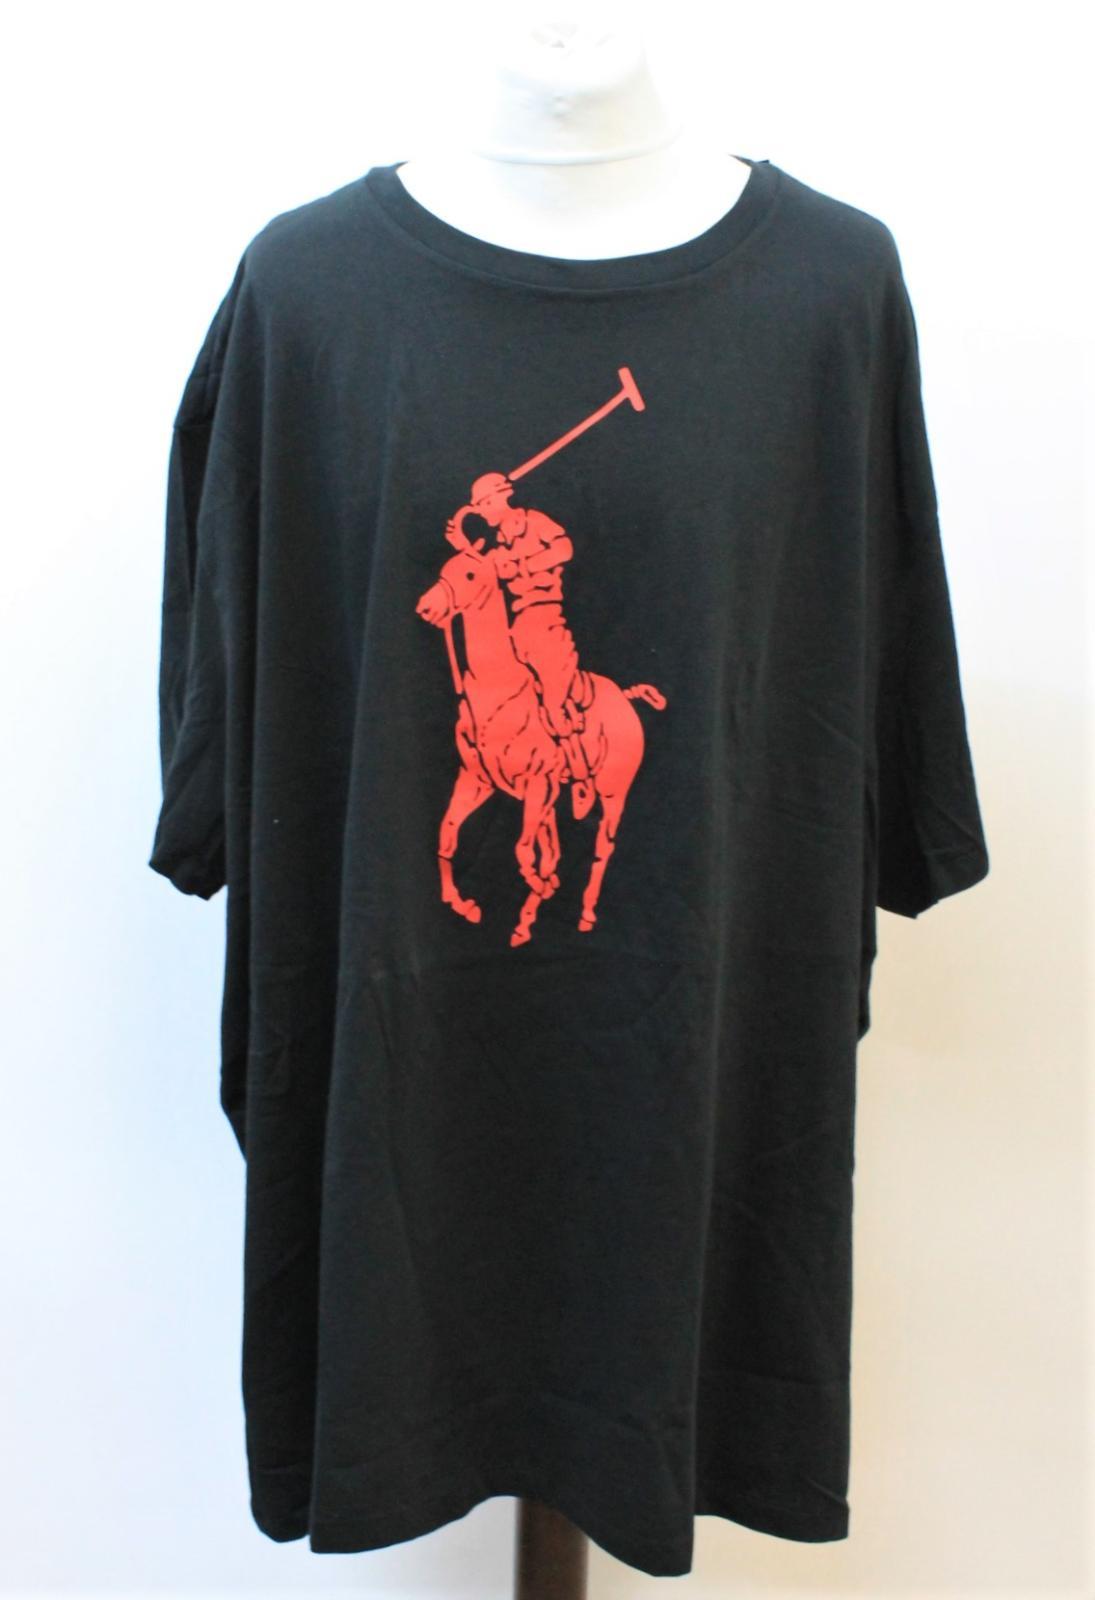 Ralph-Lauren-Polo-para-hombre-de-Big-Pony-Negra-manga-corta-camiseta-tamano-5XB-BNWT miniatura 2